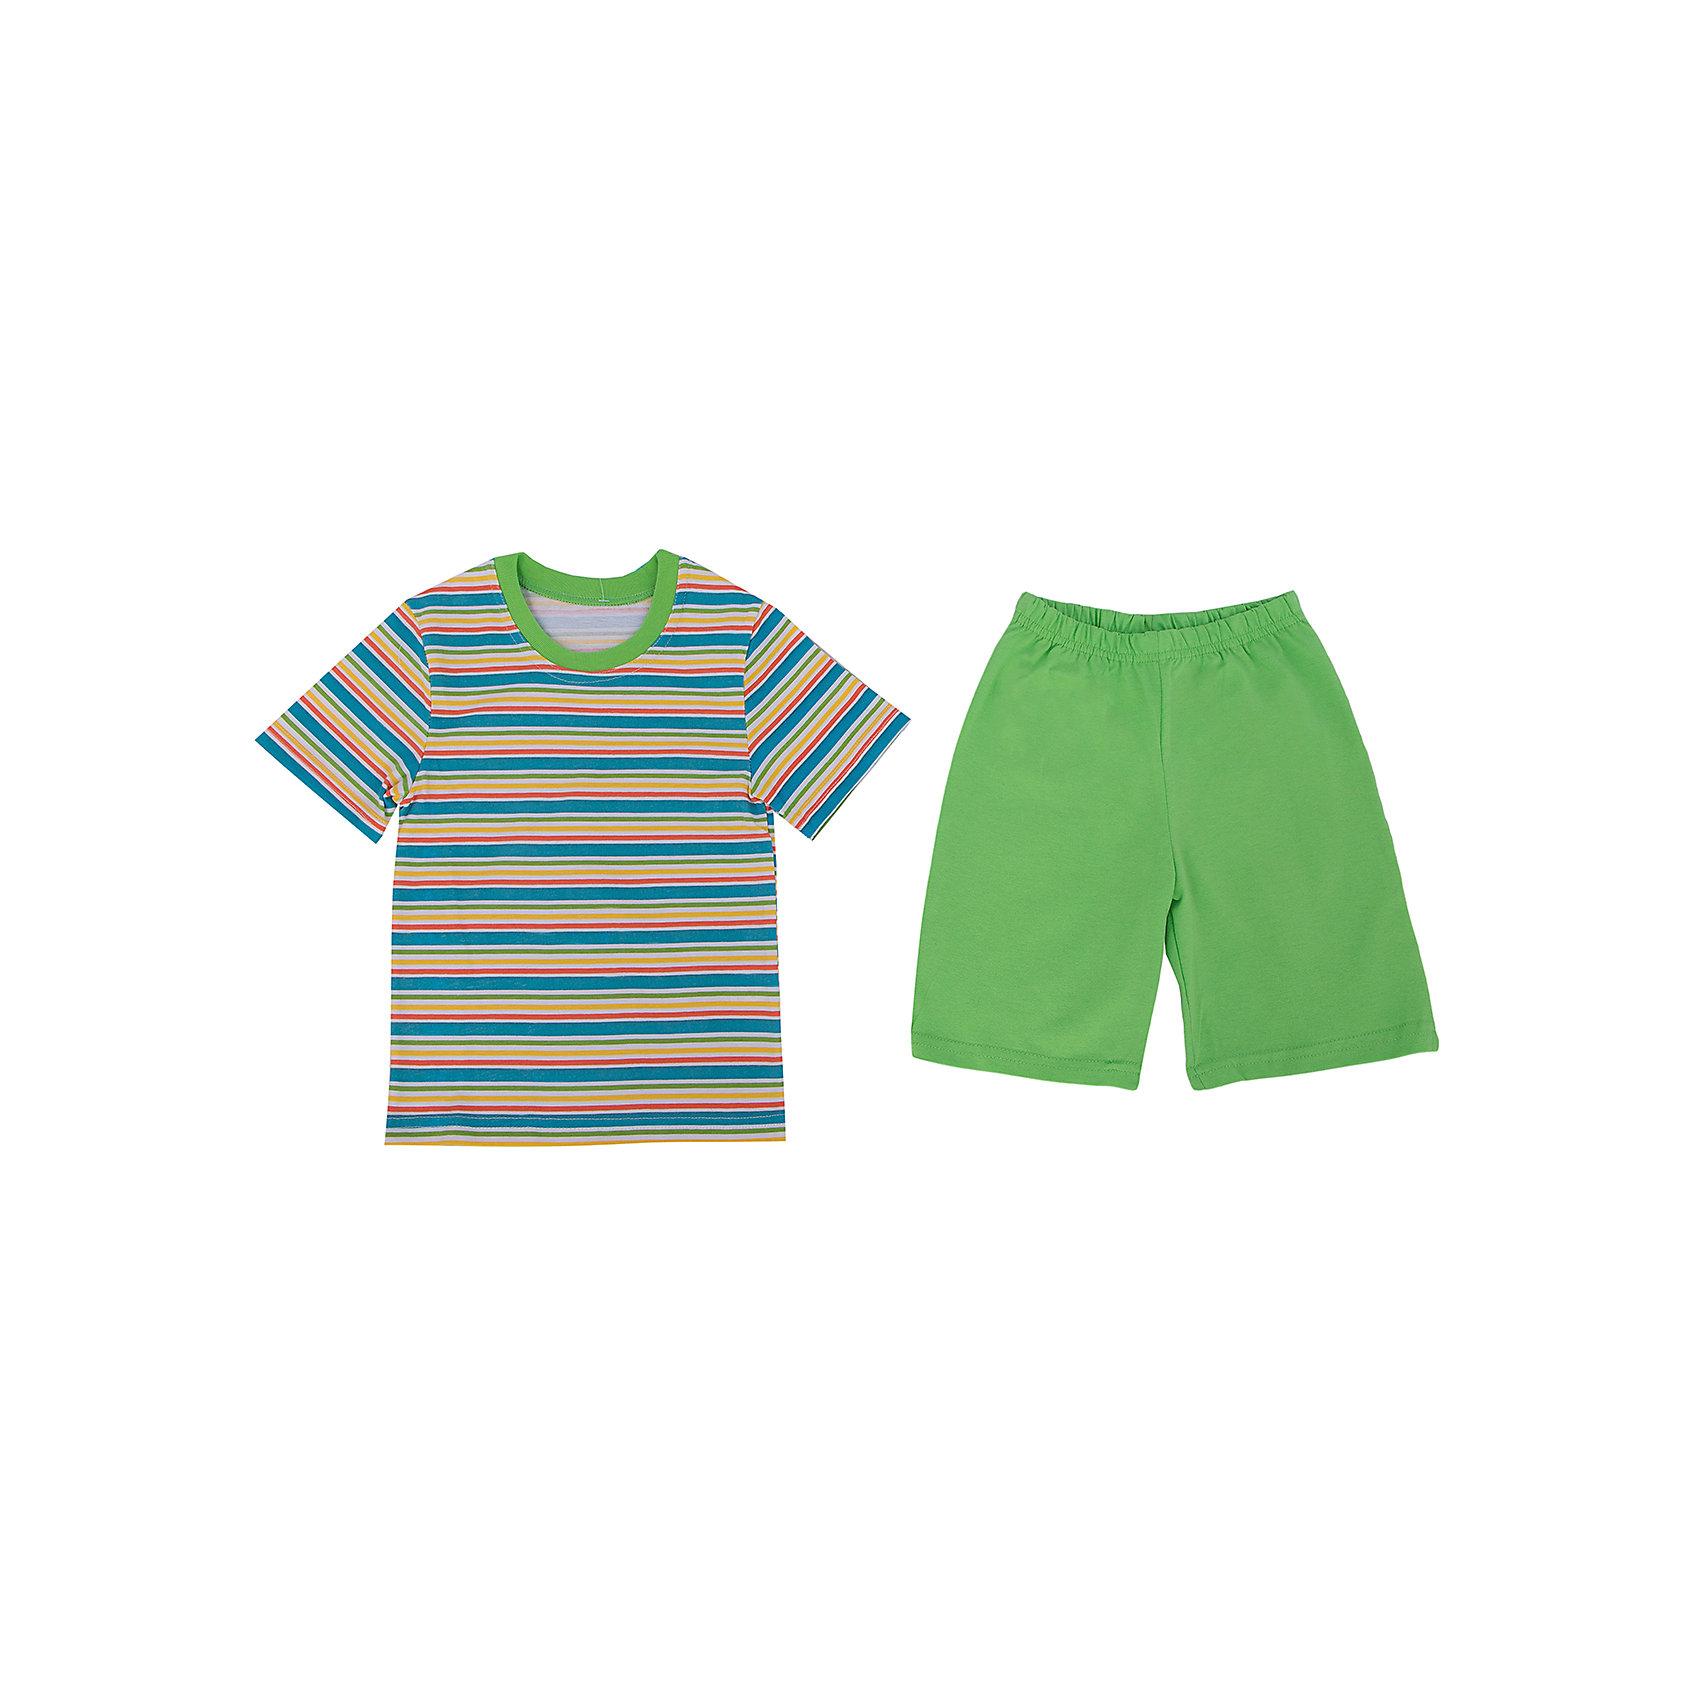 Пижама для мальчика АпрельПижама для мальчика от известного бренда Апрель.<br><br>Состав:<br>хлопок 100%<br><br>Ширина мм: 281<br>Глубина мм: 70<br>Высота мм: 188<br>Вес г: 295<br>Цвет: разноцветный<br>Возраст от месяцев: 12<br>Возраст до месяцев: 18<br>Пол: Мужской<br>Возраст: Детский<br>Размер: 86,98,104,110<br>SKU: 4768073